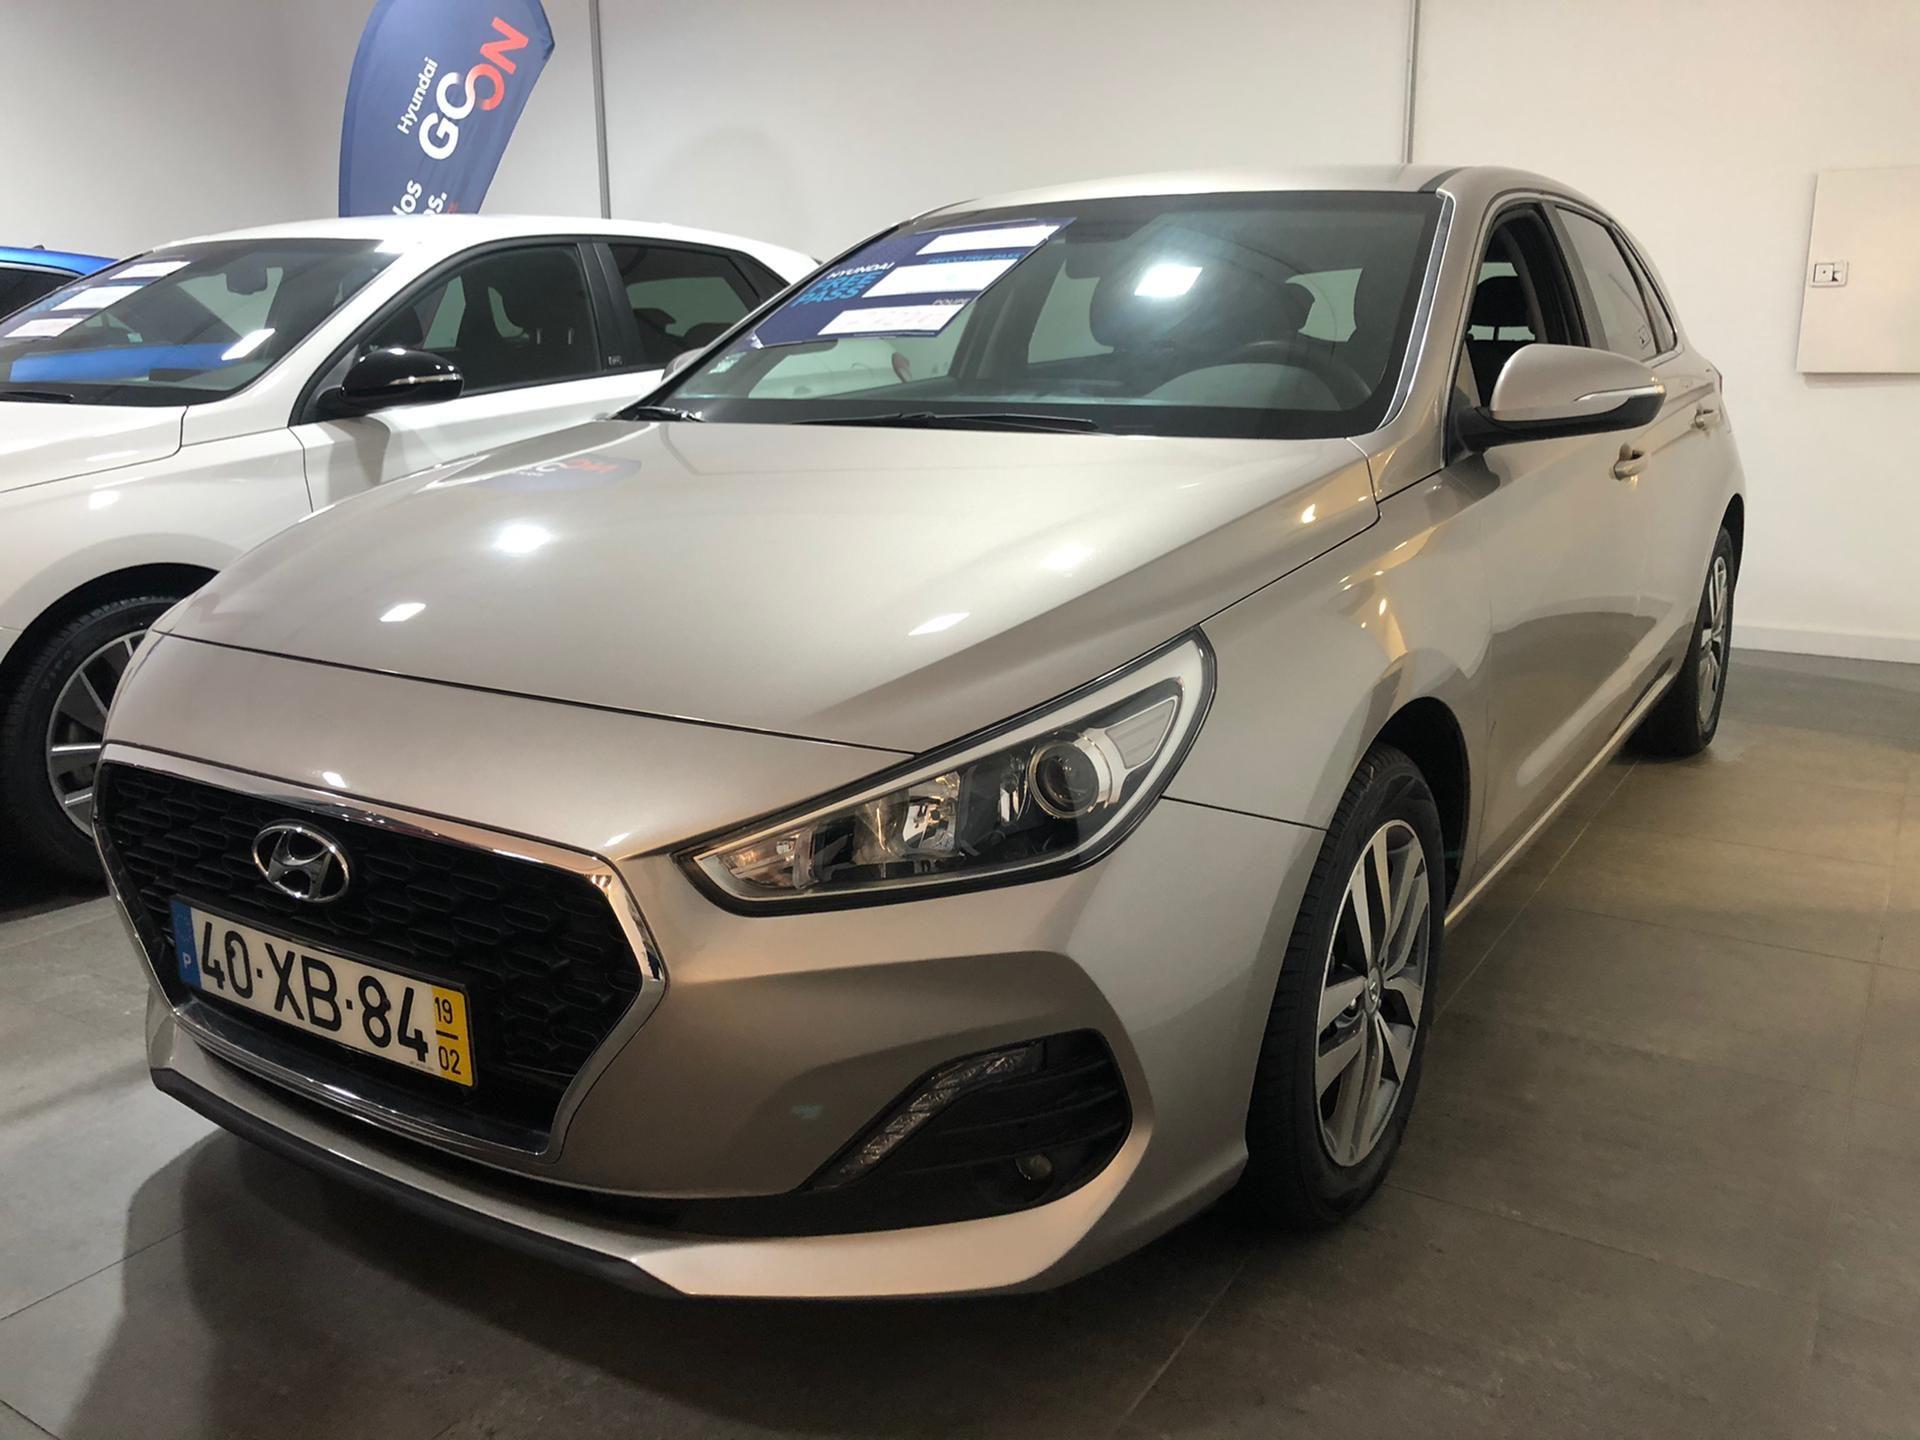 Hyundai i30 5P 1.0 TGDi MY19 STYLE segunda mão Lisboa